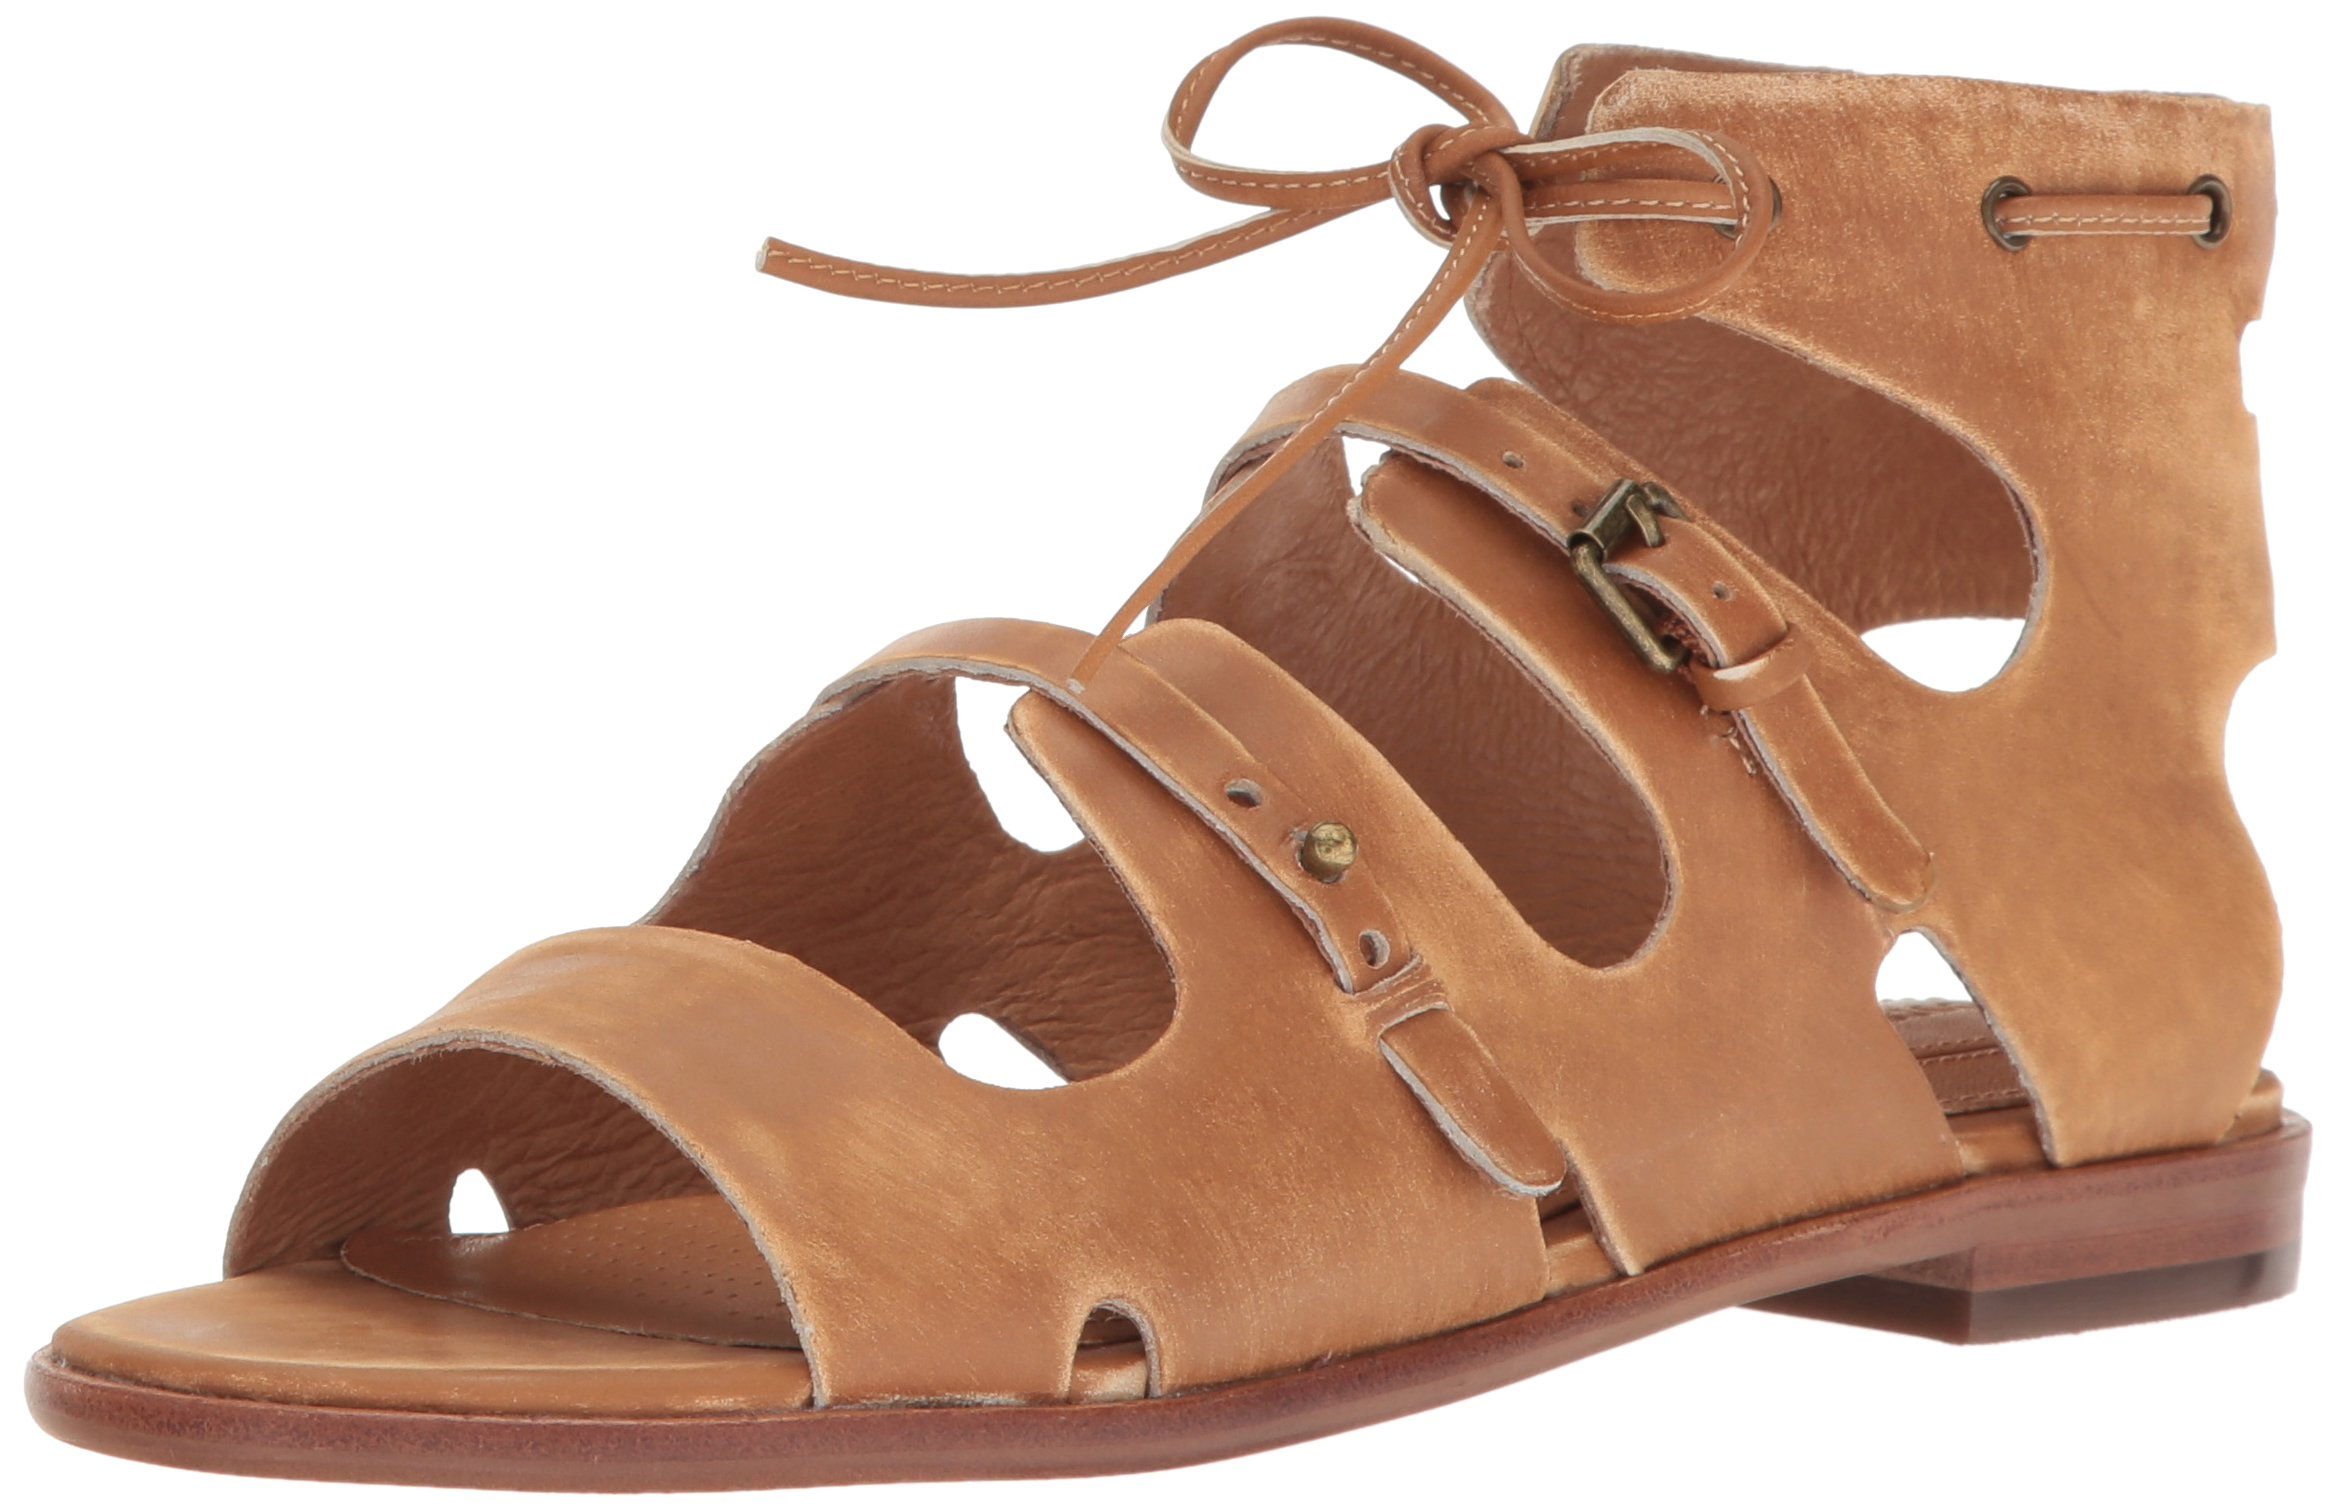 Corso Como Women's Tiki Flat Sandal, Camel Worn Leather, 8.5 US/8.5 M US